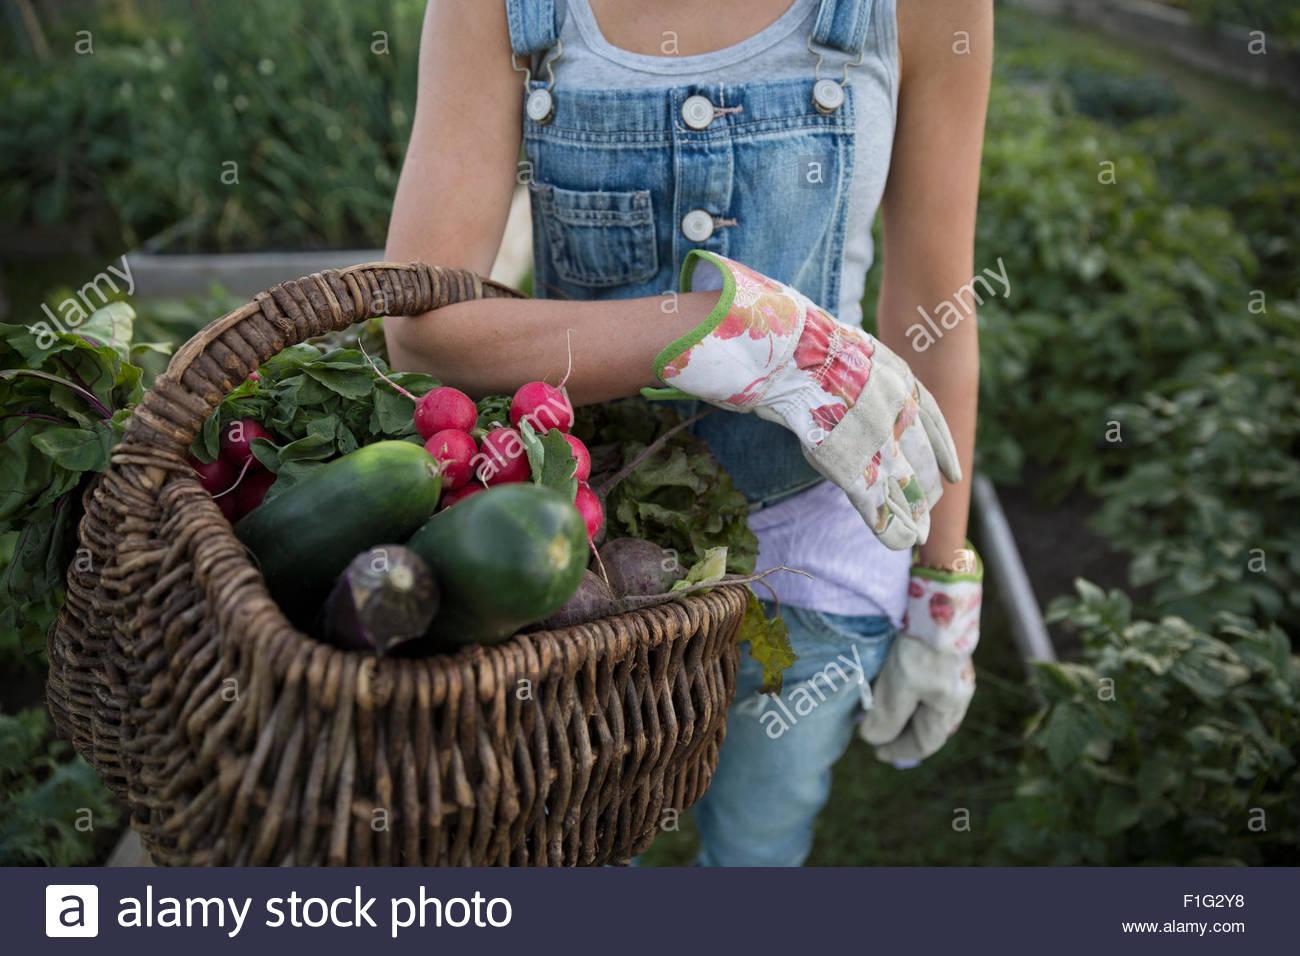 Close up woman holding fresh harvested vegetables basket - Stock Image